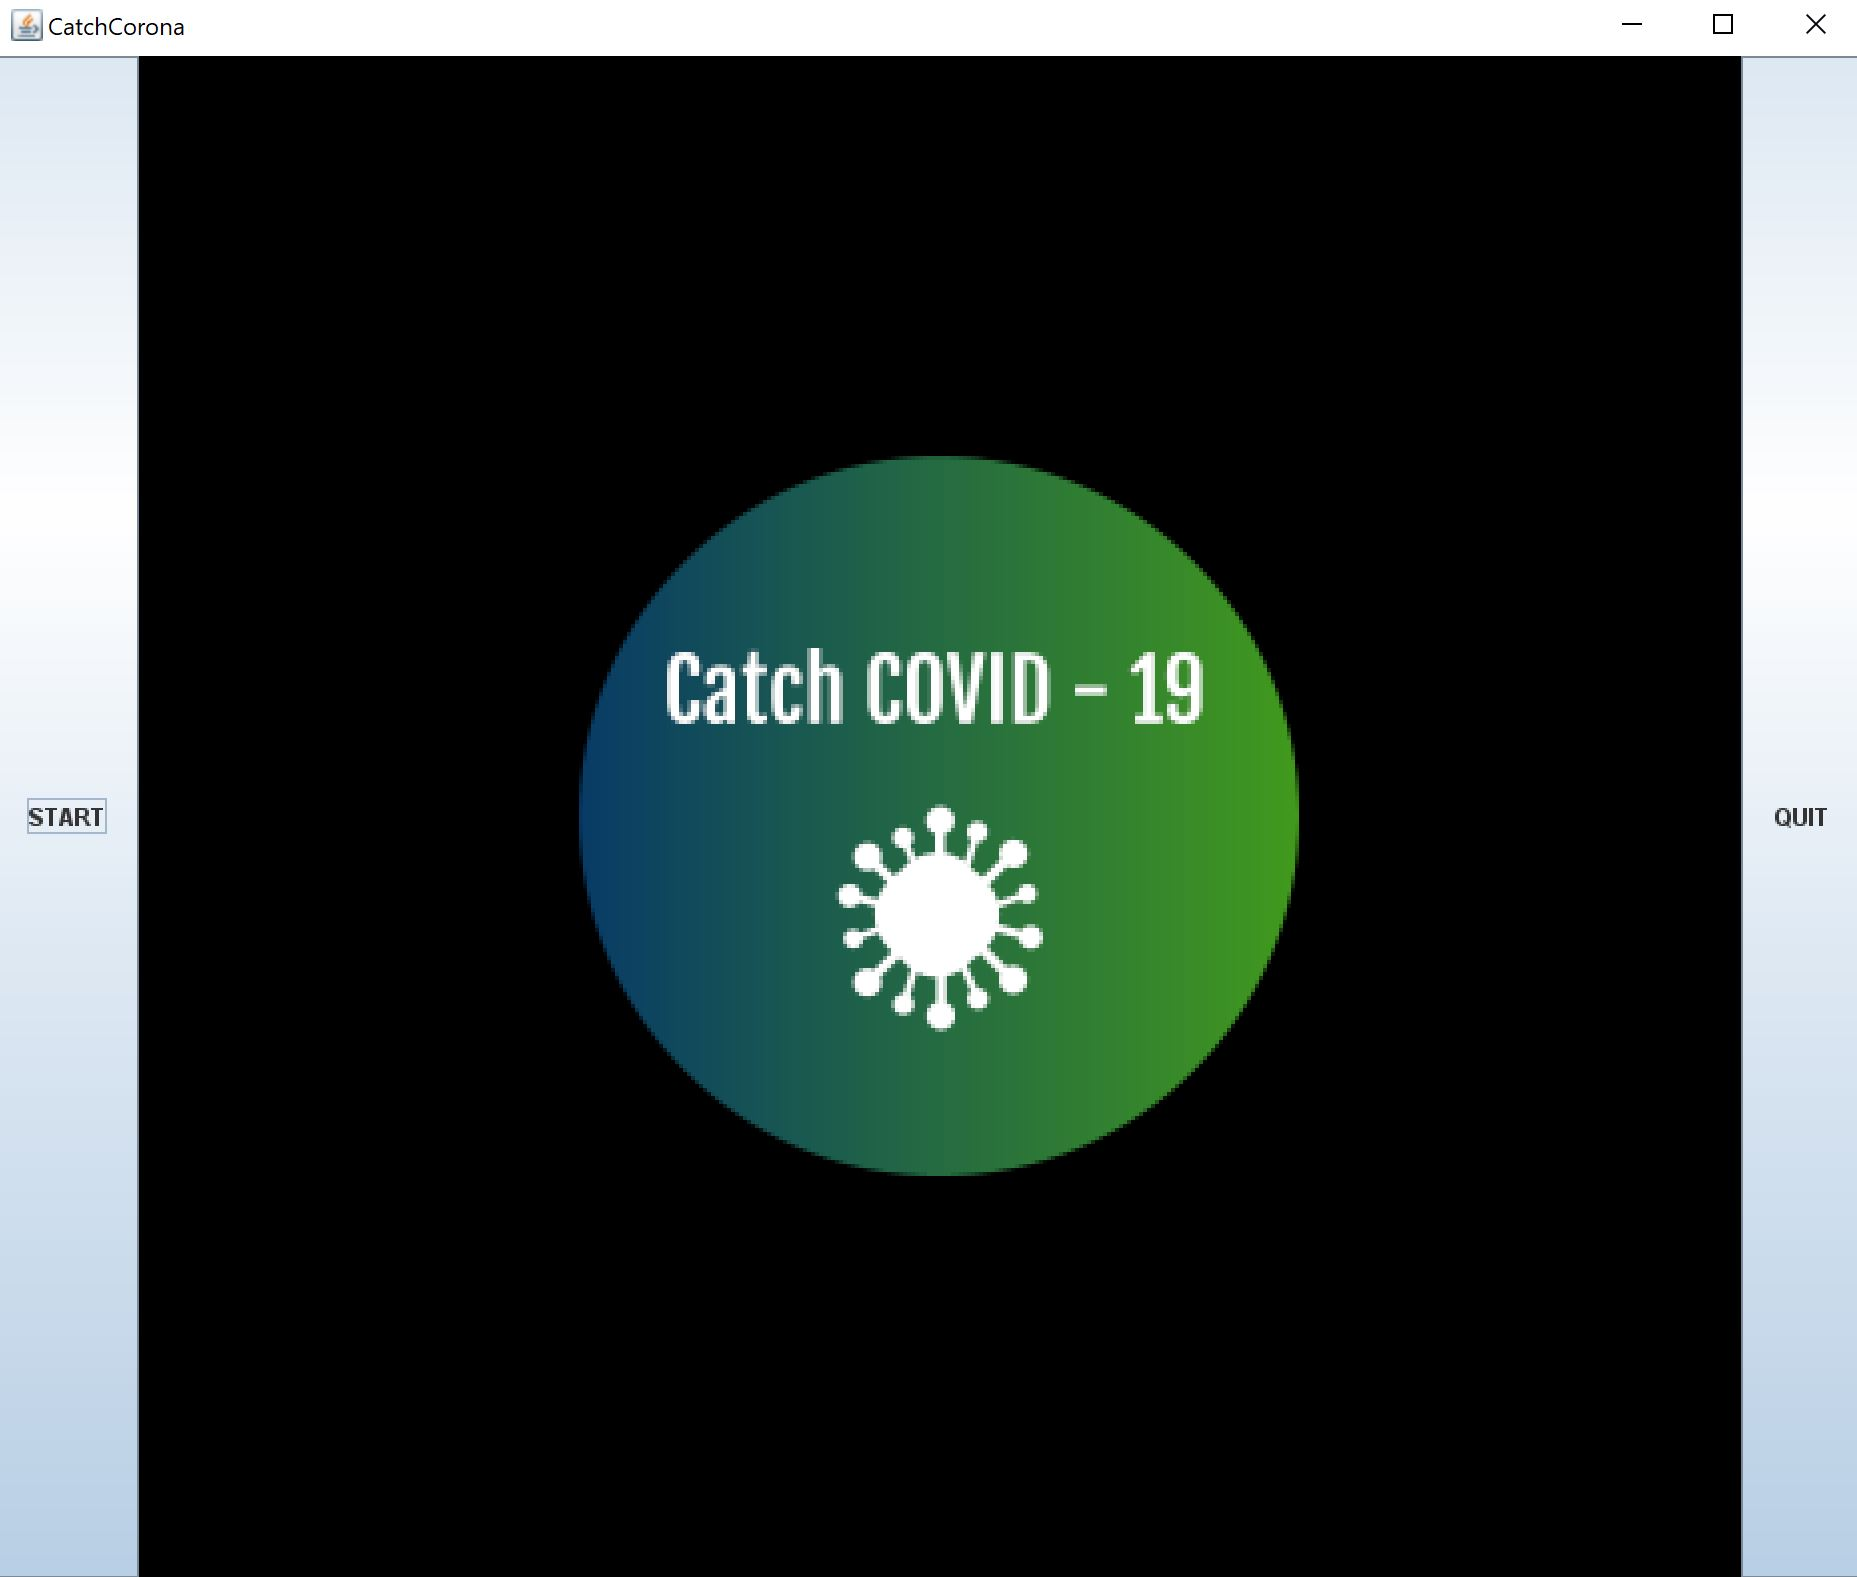 Catch COVID-19